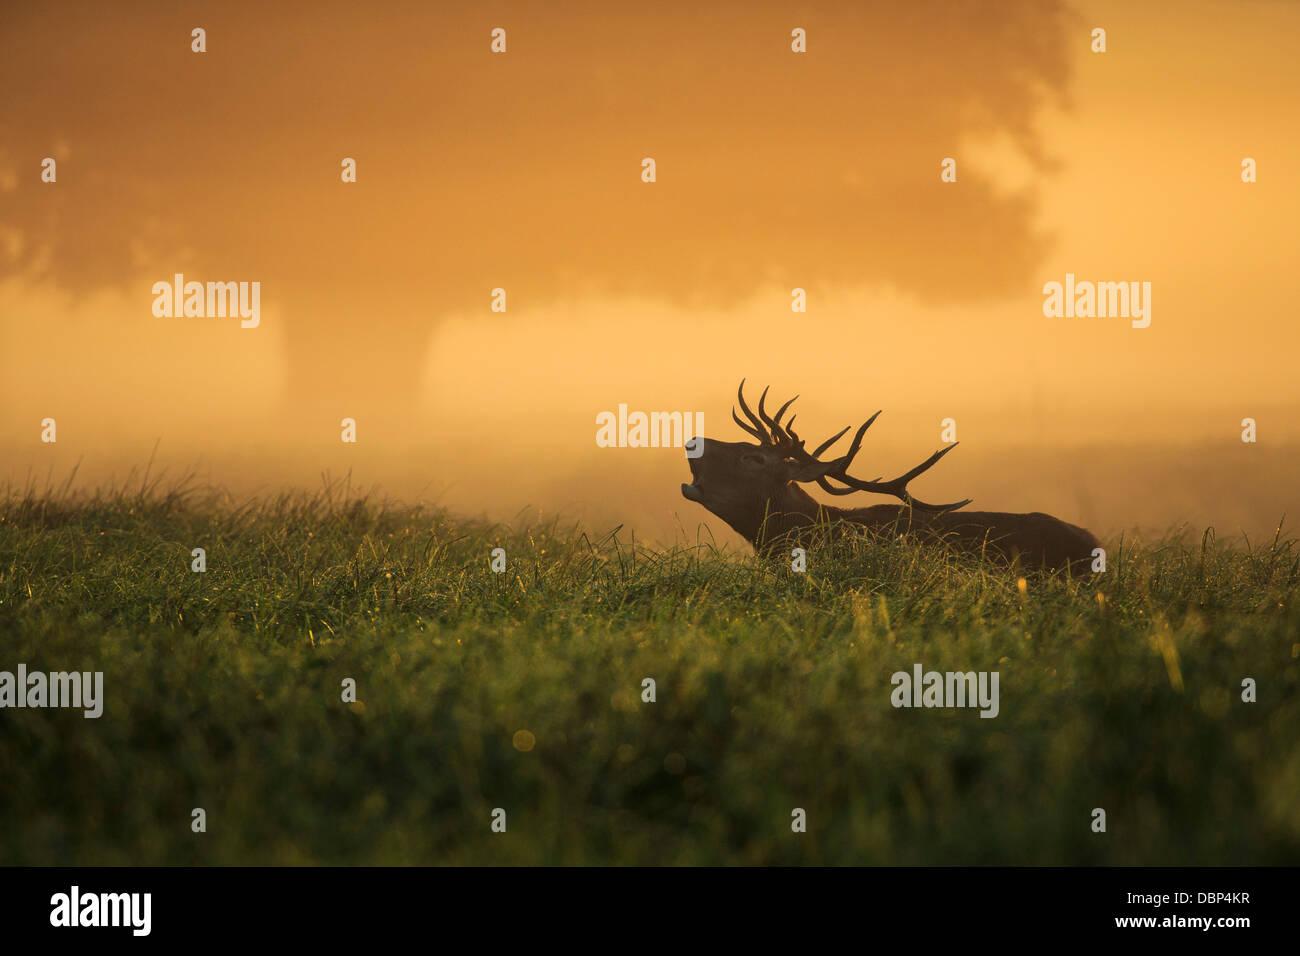 Hirsch im Feld in der Dämmerung Stockbild